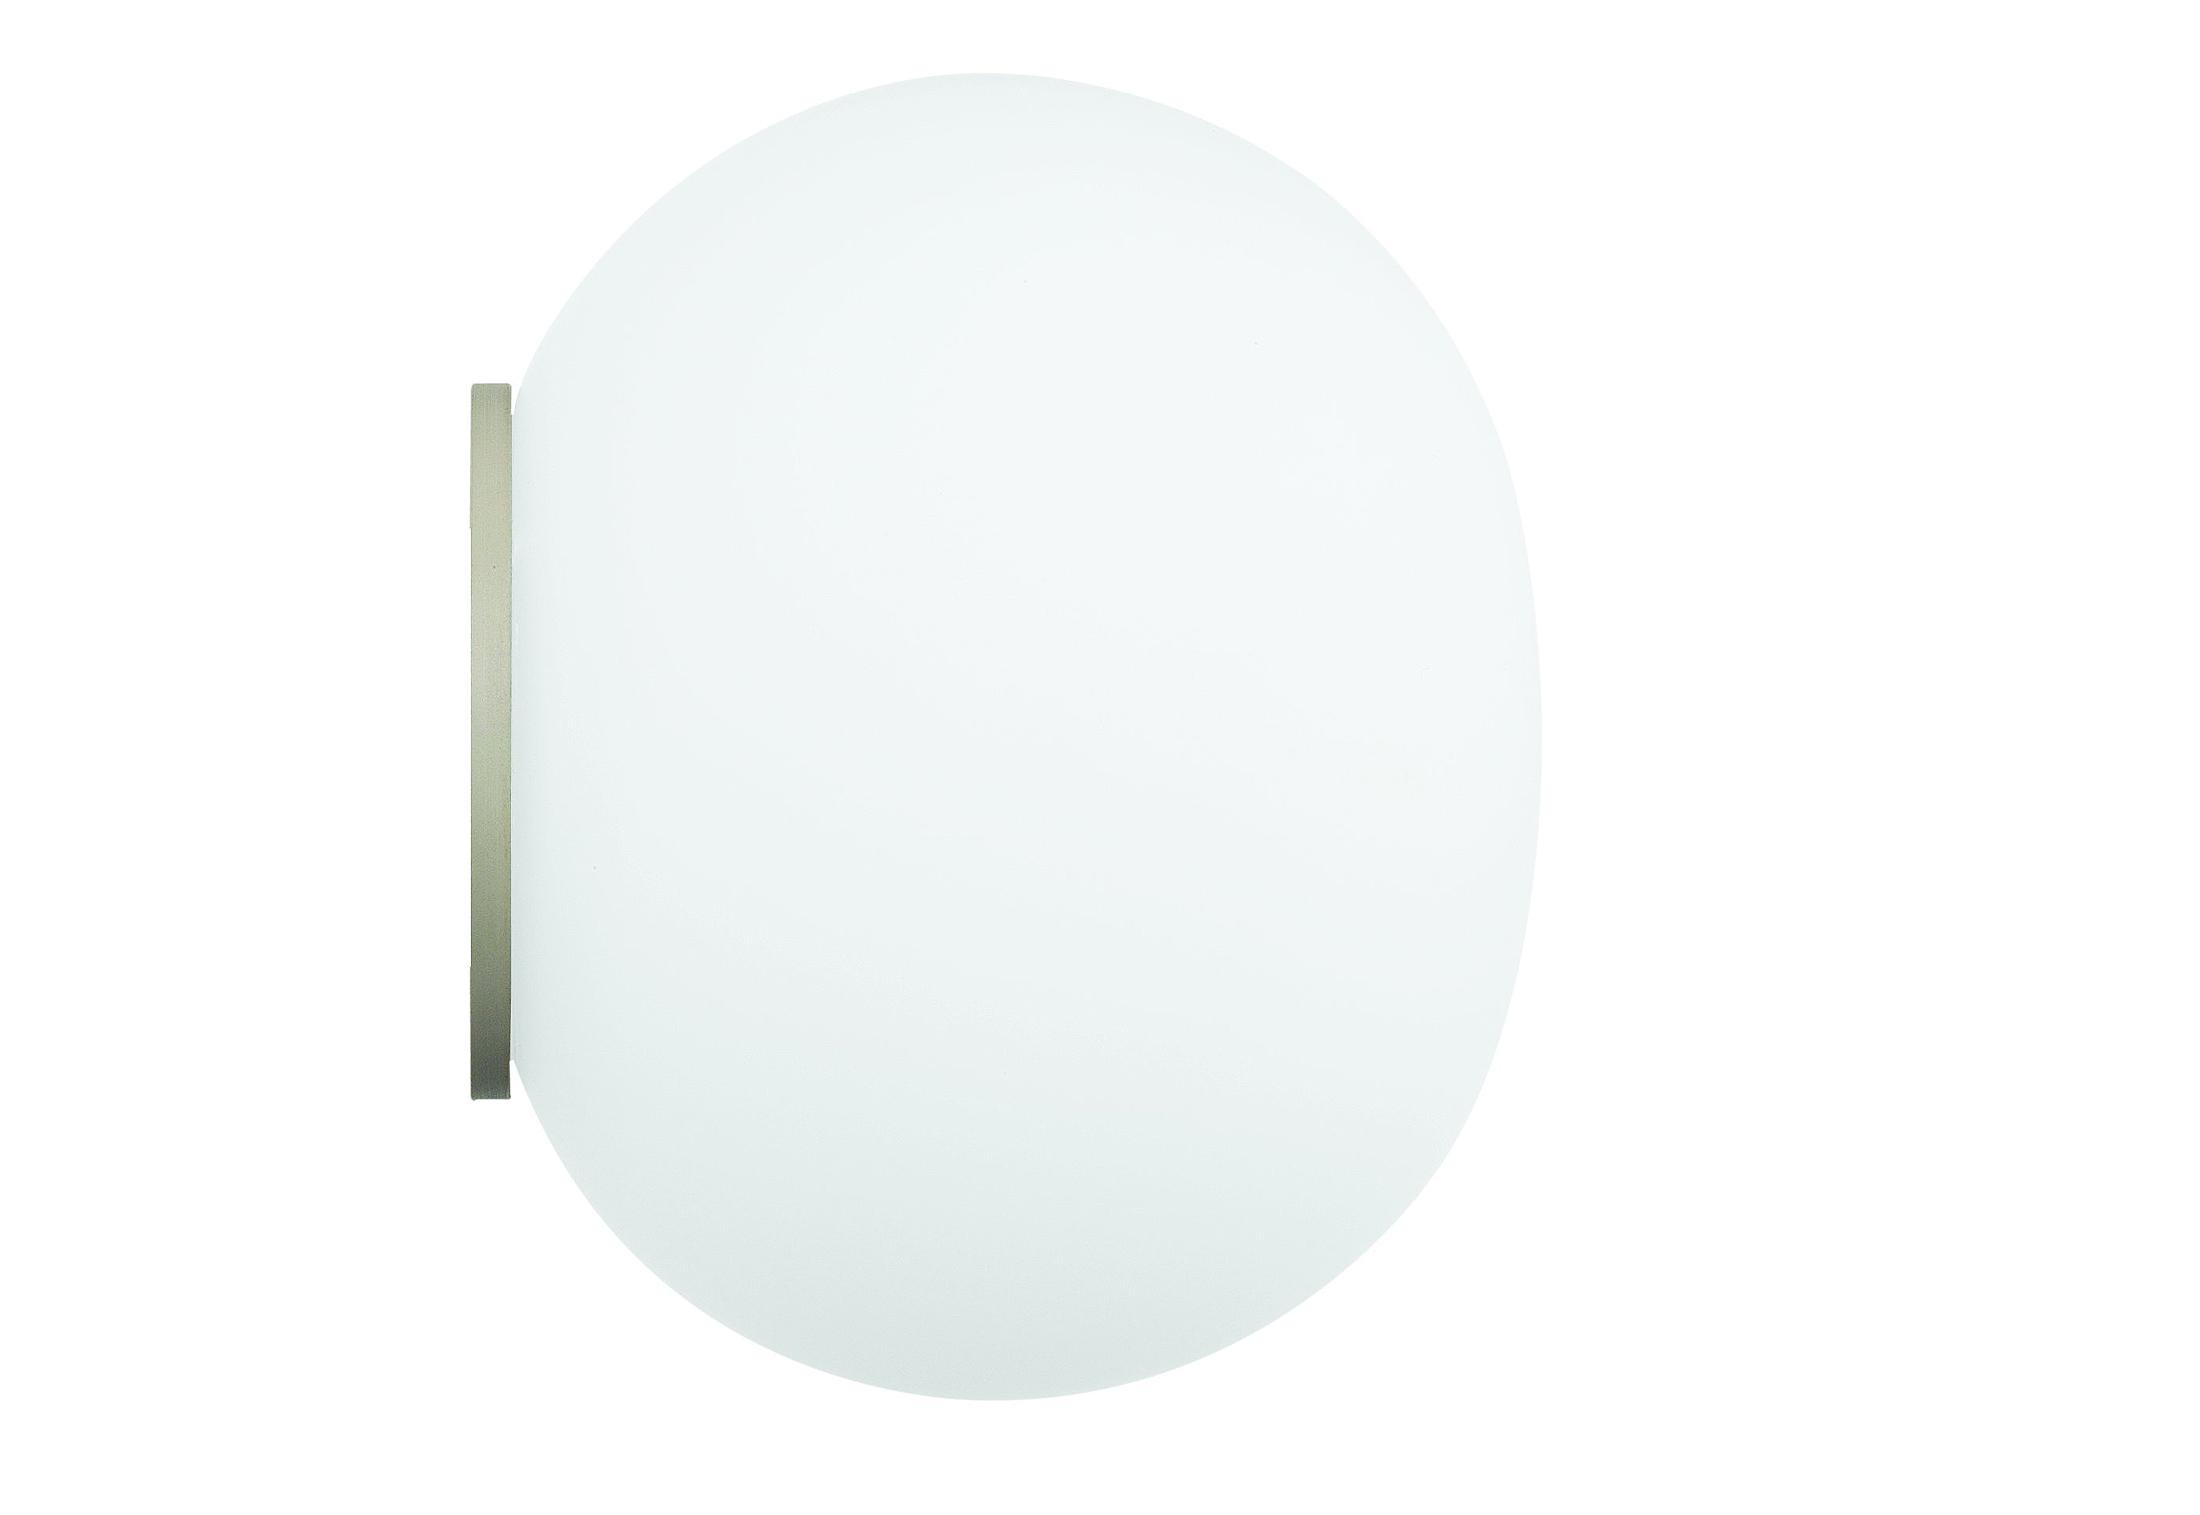 glo-ball-mini-wall-lamp-1 Elegantes Flos Glo Ball S Dekorationen